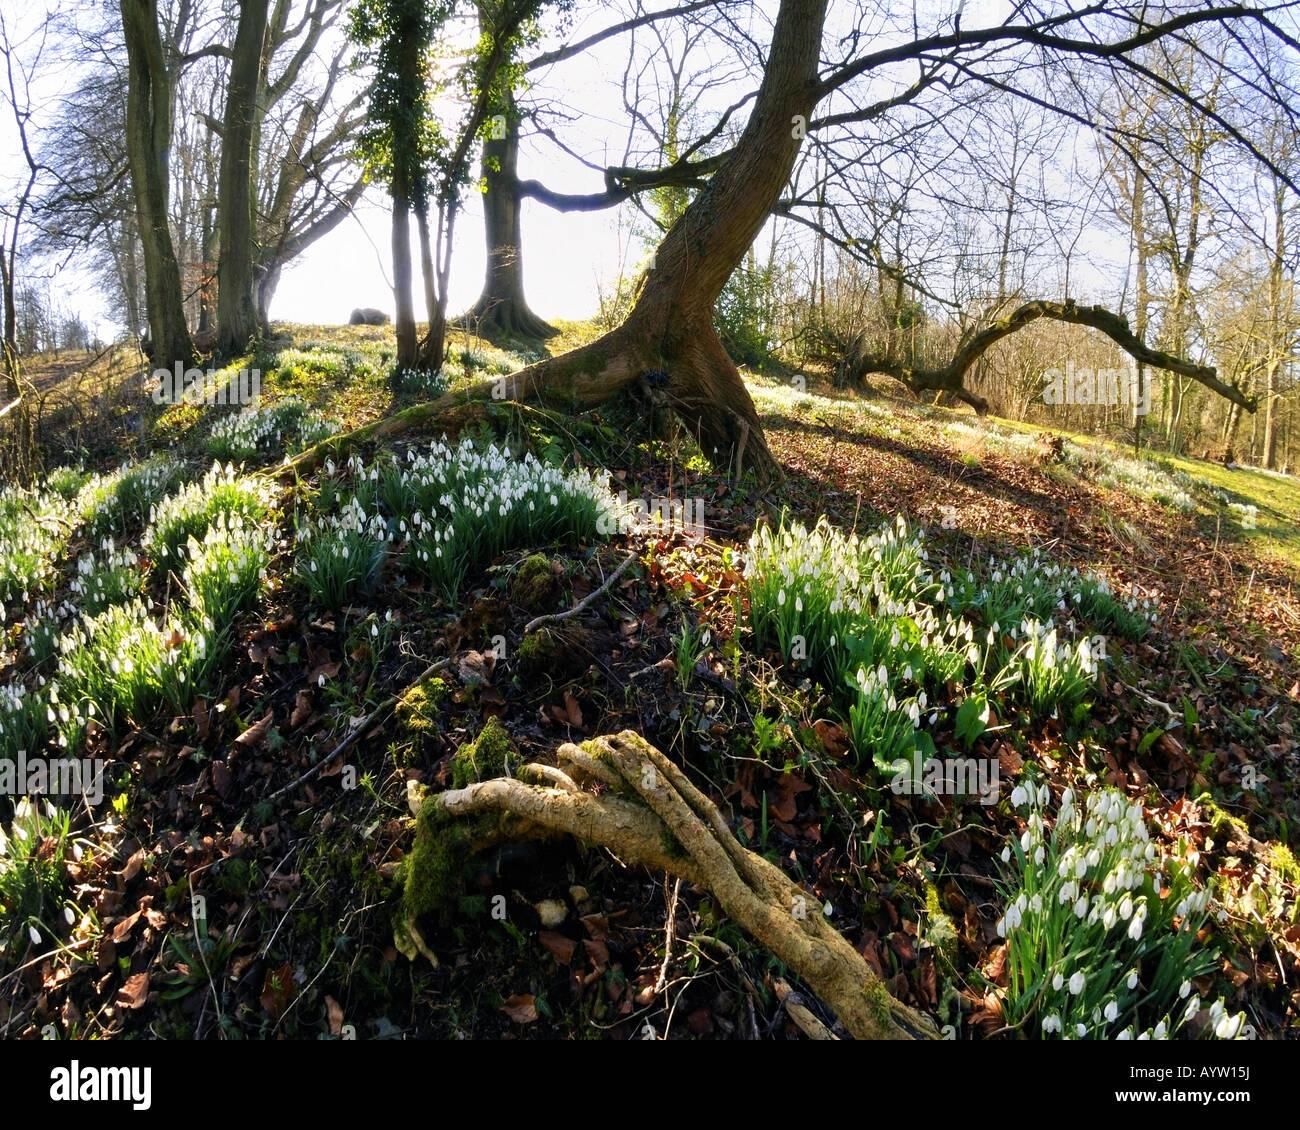 GB - GLOUCESTERSHIRE:  Snowdrops at Hilcot Wood near Cheltenham - Stock Image